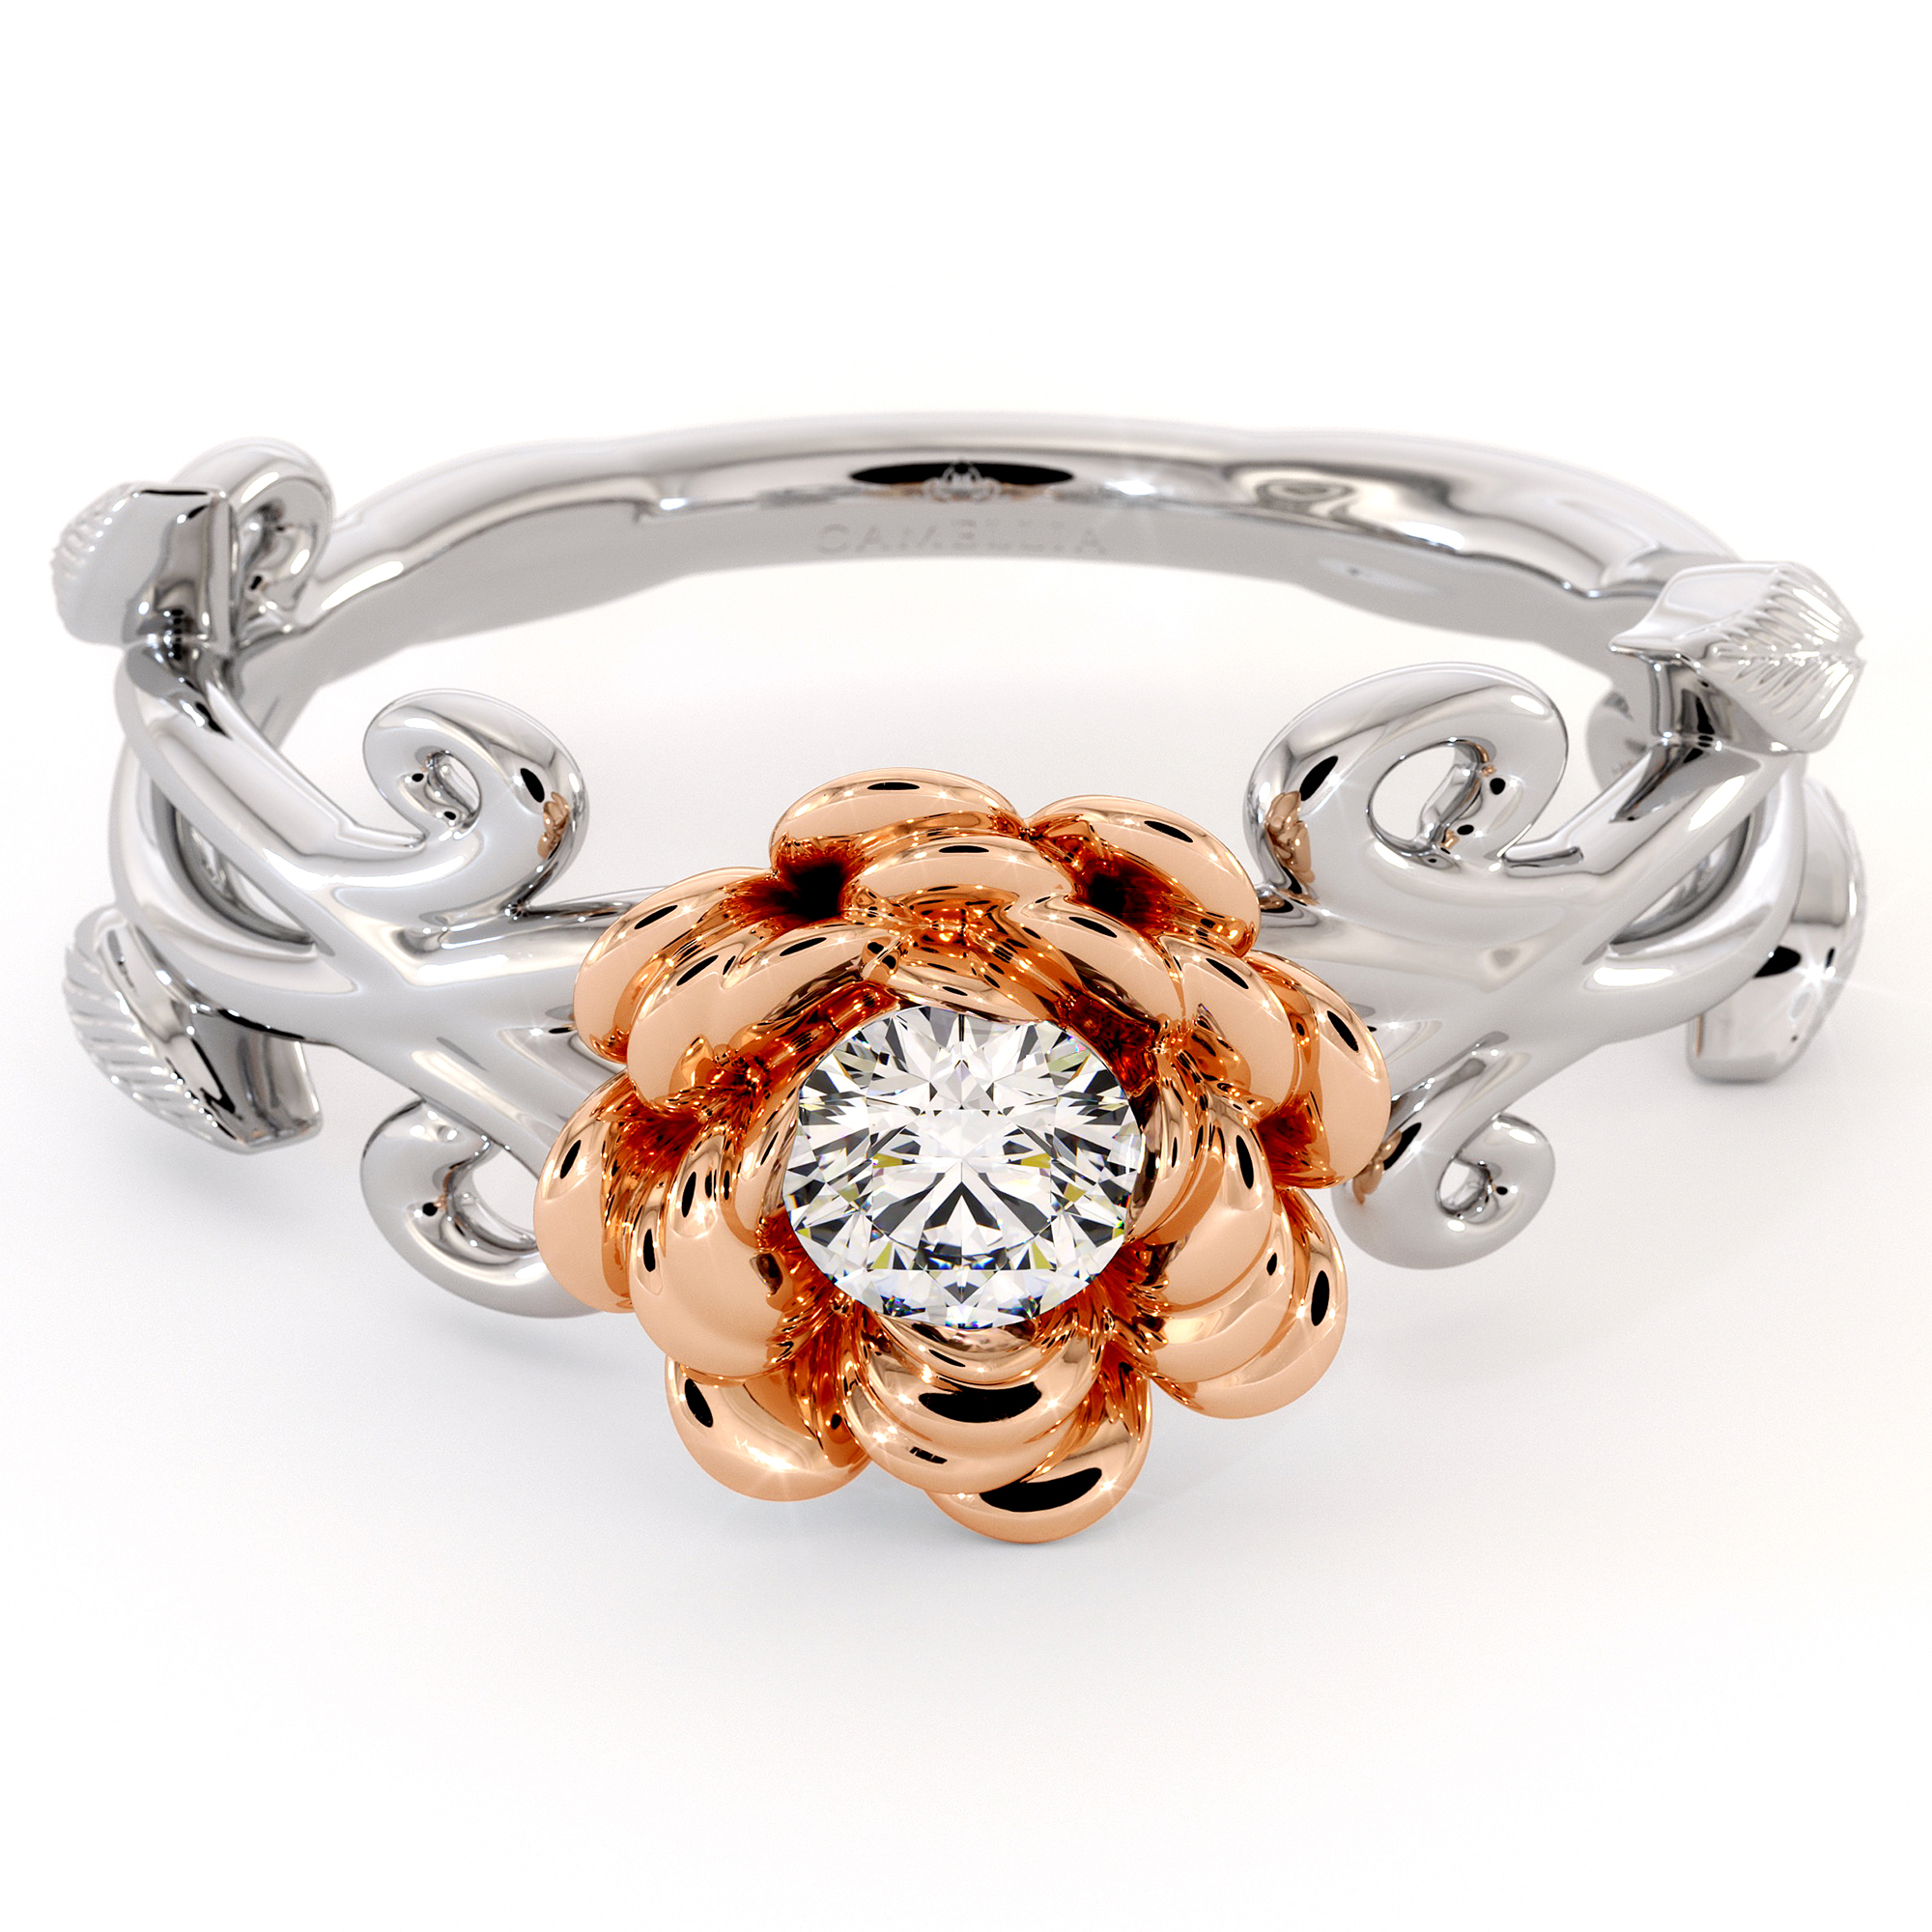 Diamond Engagement Ring Flower Ring 2 Tone Gold Ring Solitaire Ring Flower Leaves Engagement Ring